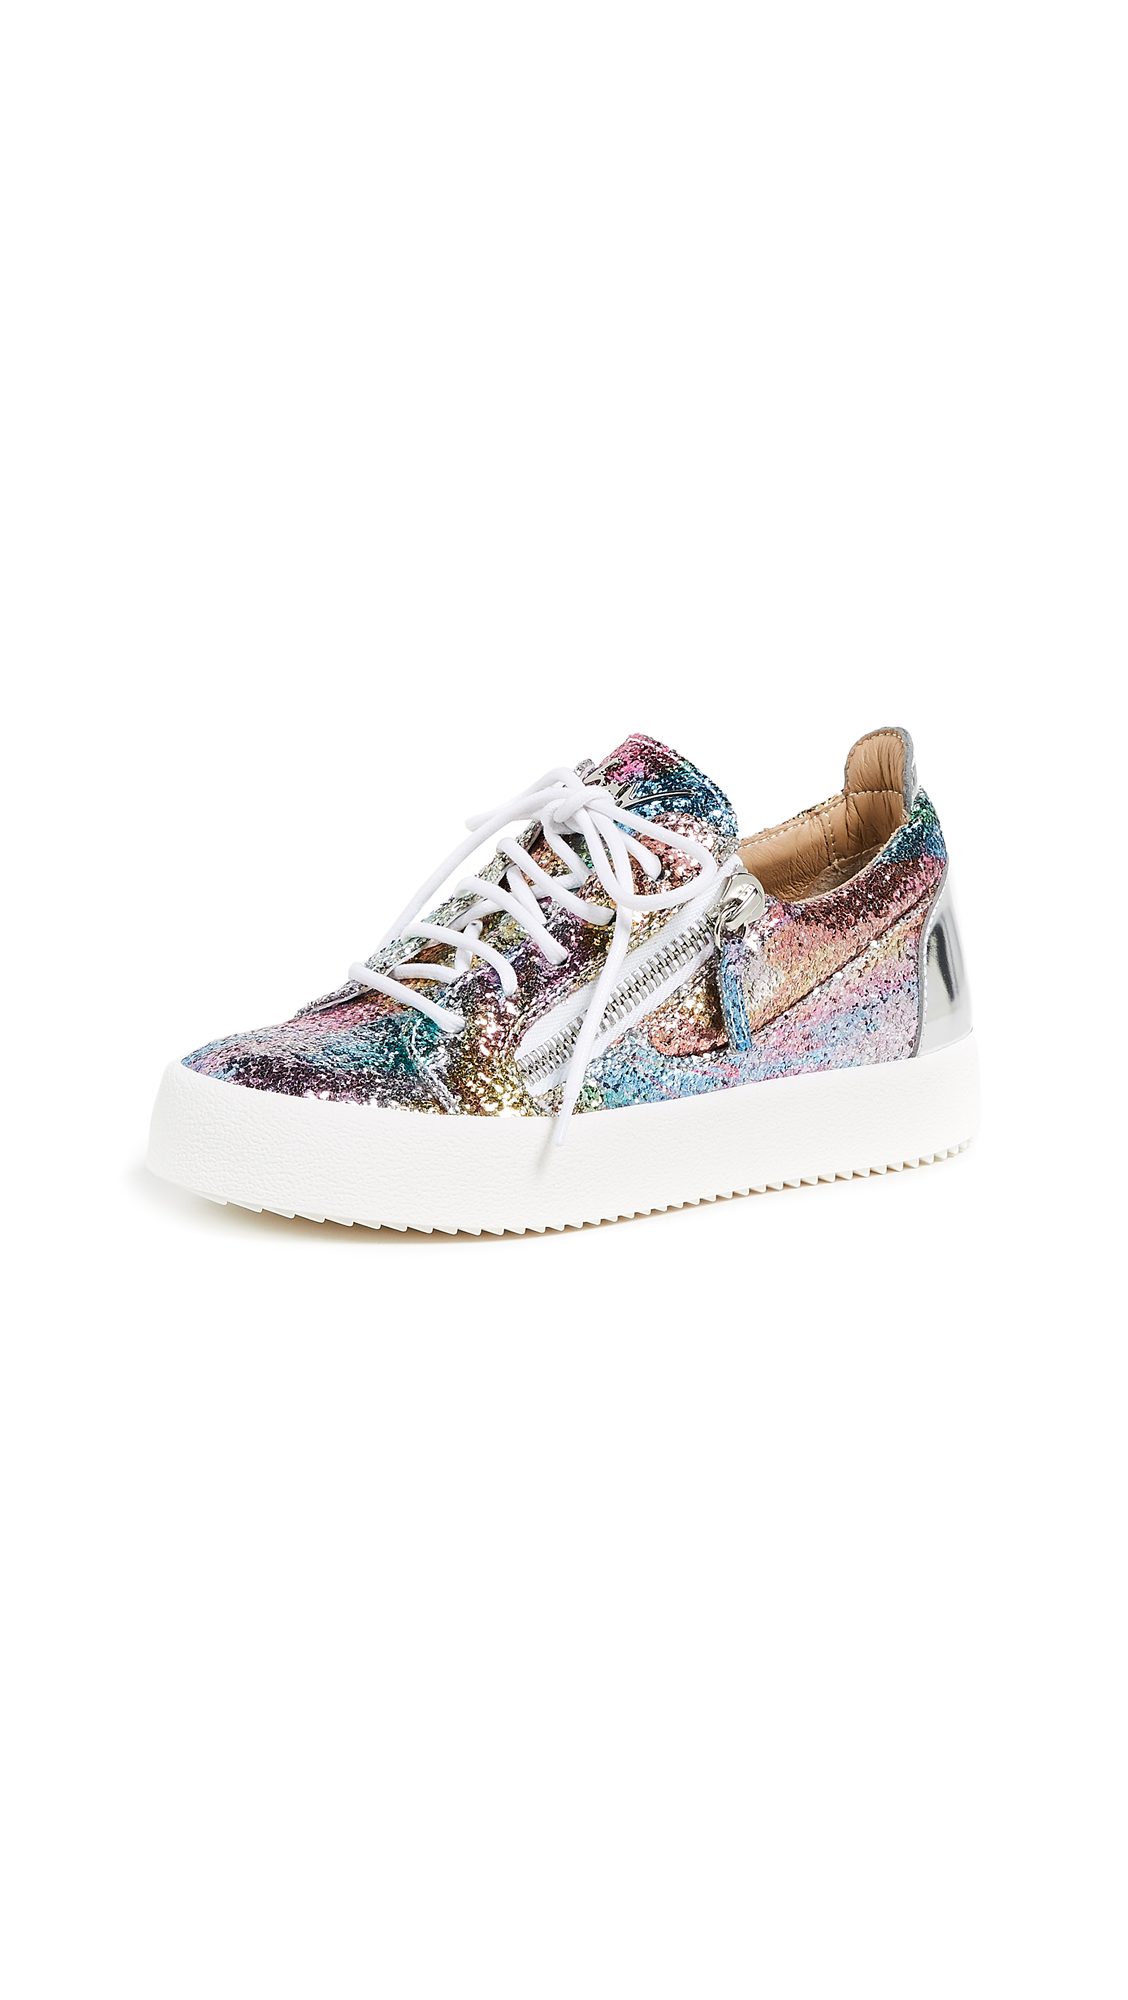 Giuseppe Zanotti May Zip Sneakers - Multi